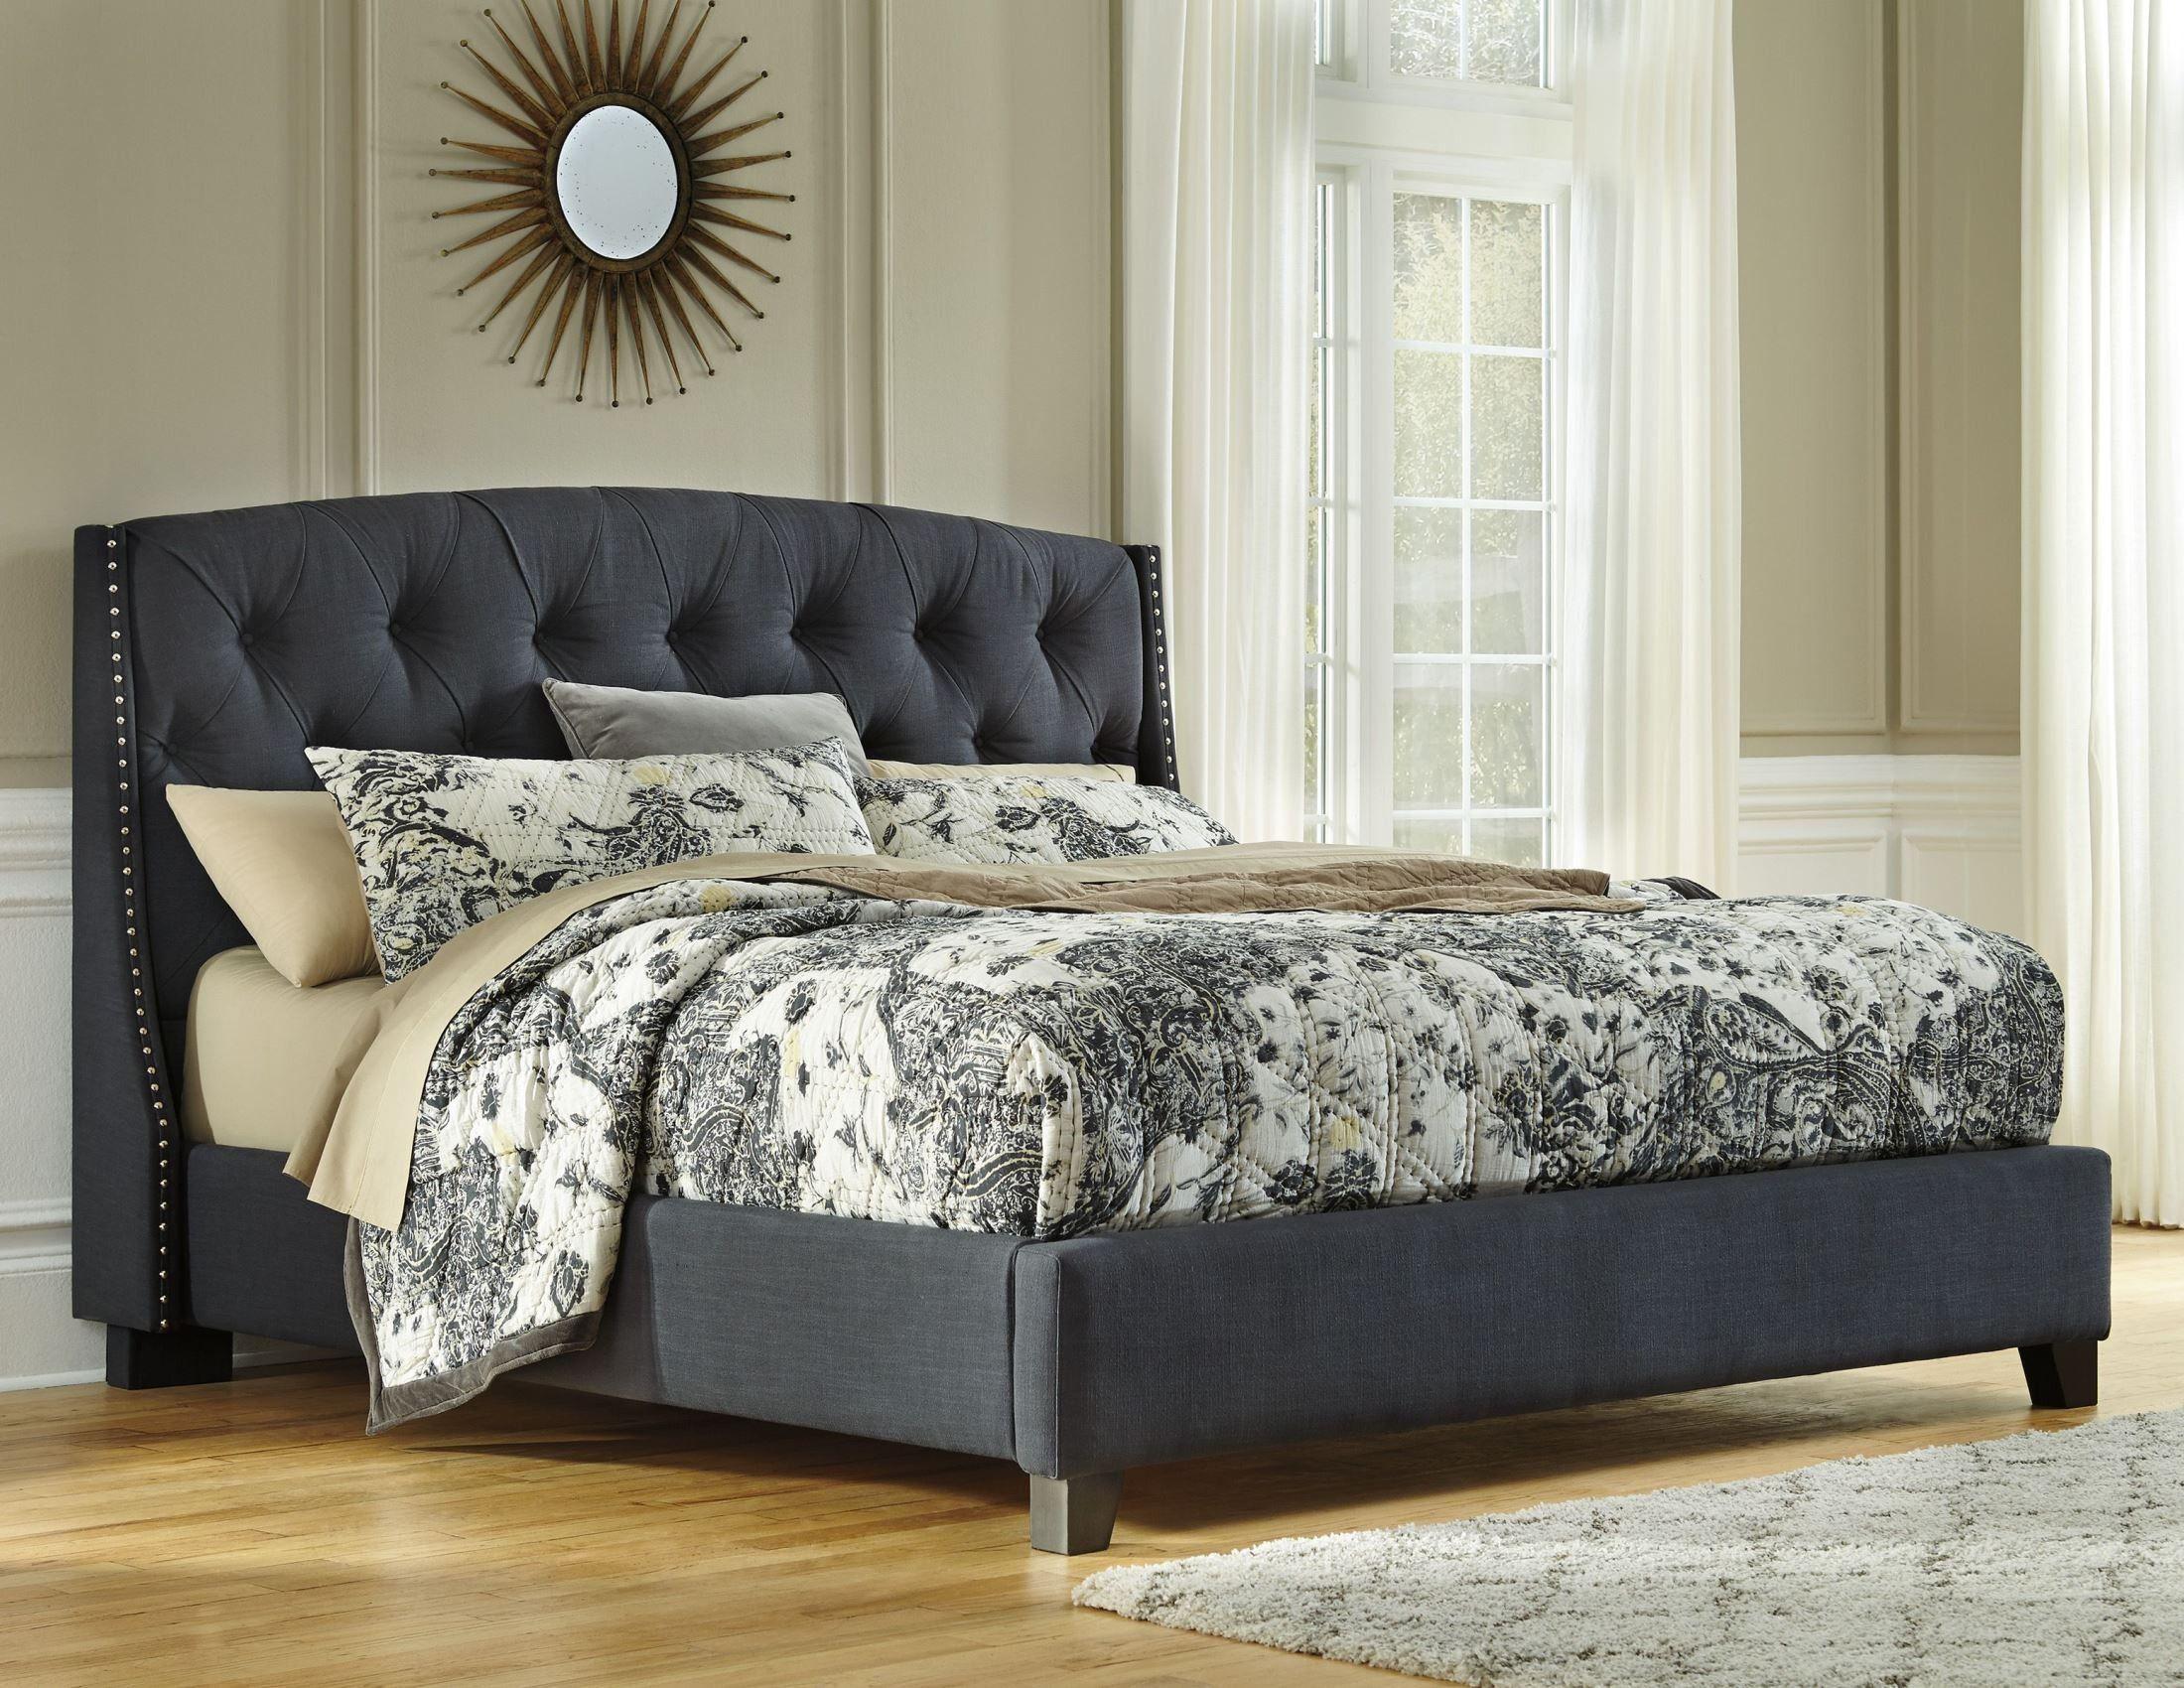 Platform Bed Bedroom Set King Upholstered Platform Bed With Thick Blanket And Pillows